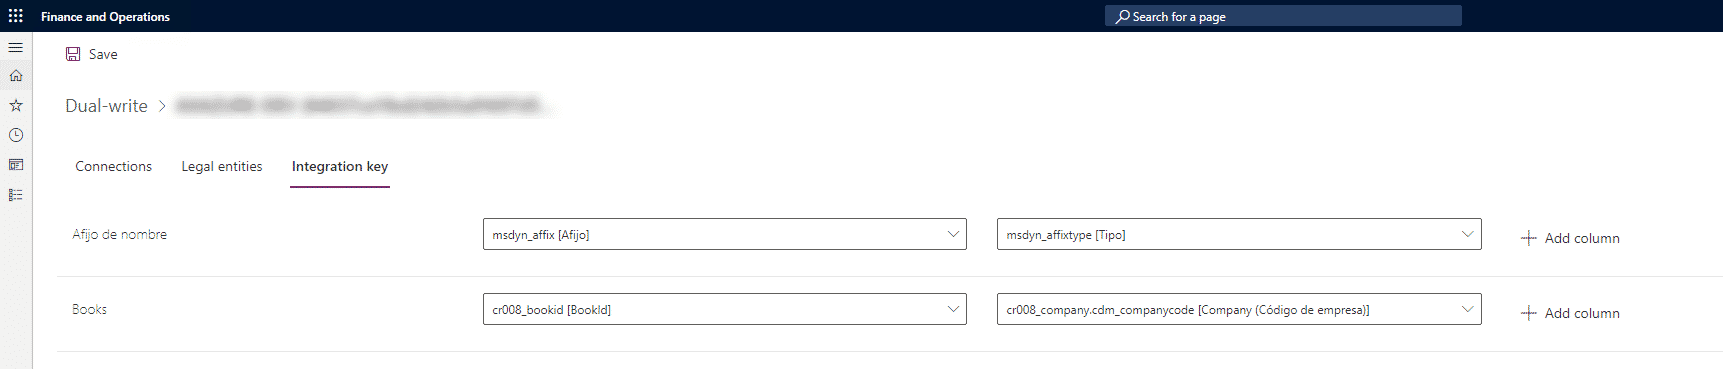 Dual/write integration key